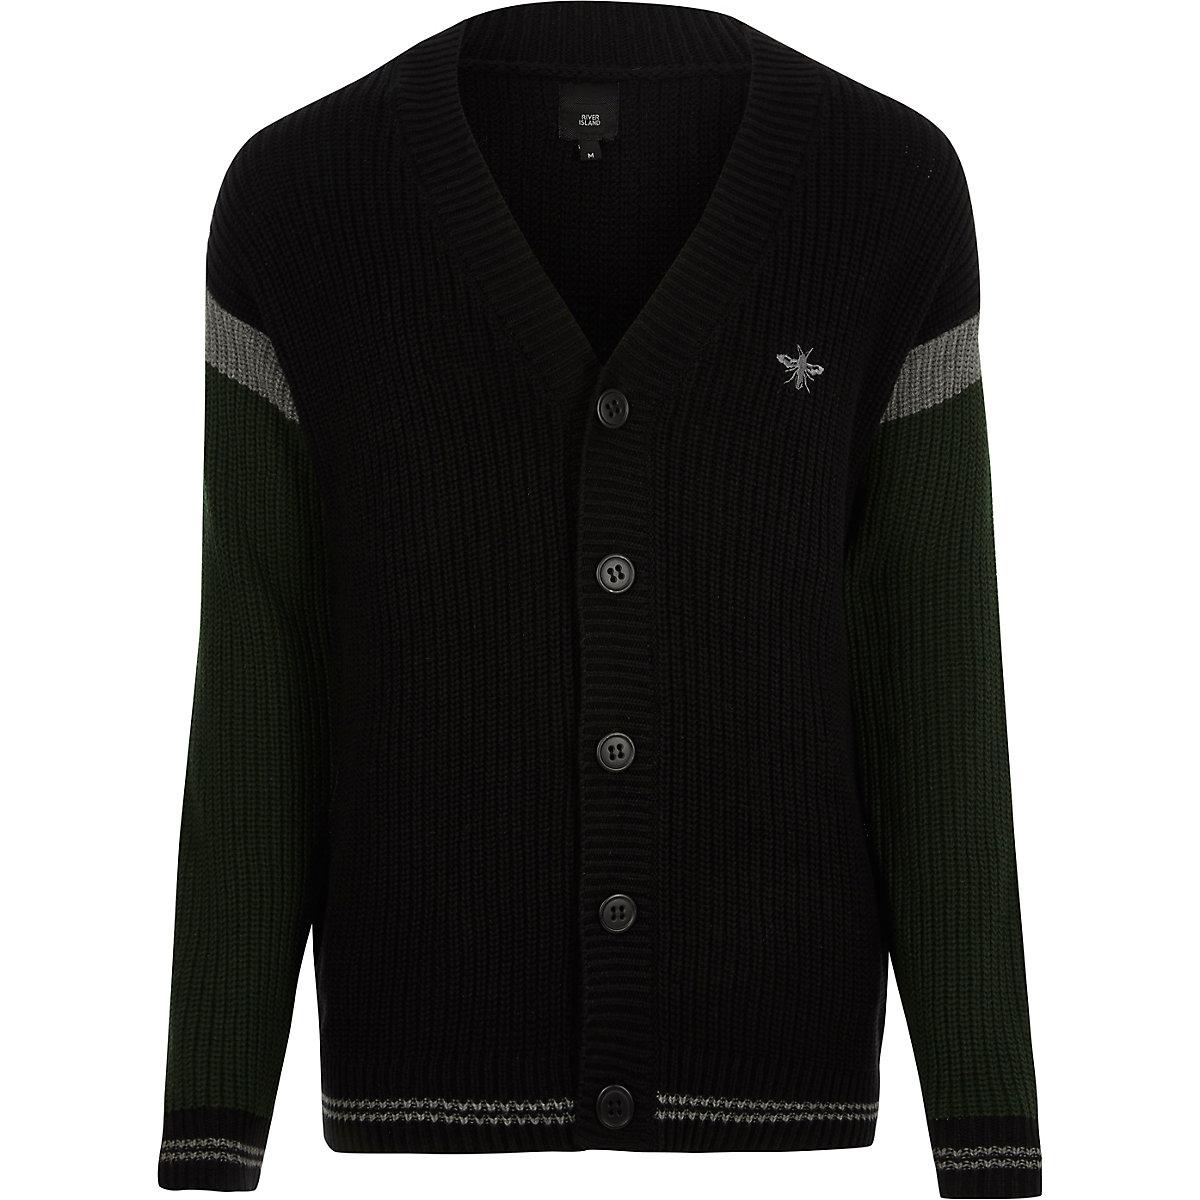 Black block stripe sleeve knit cardigan